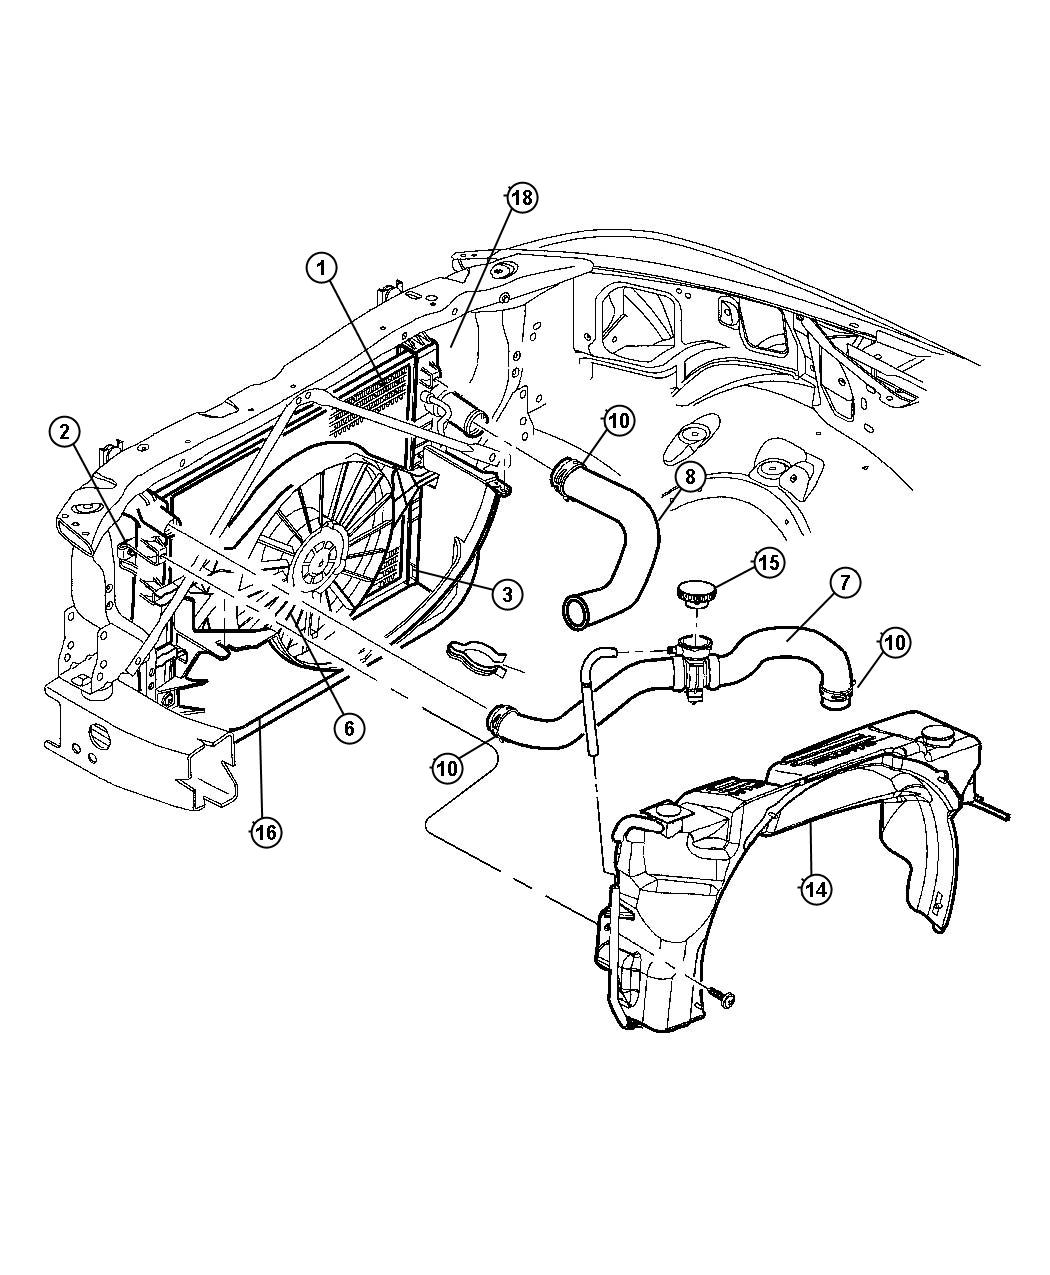 Dodge Dakota Engine Parts Diagram